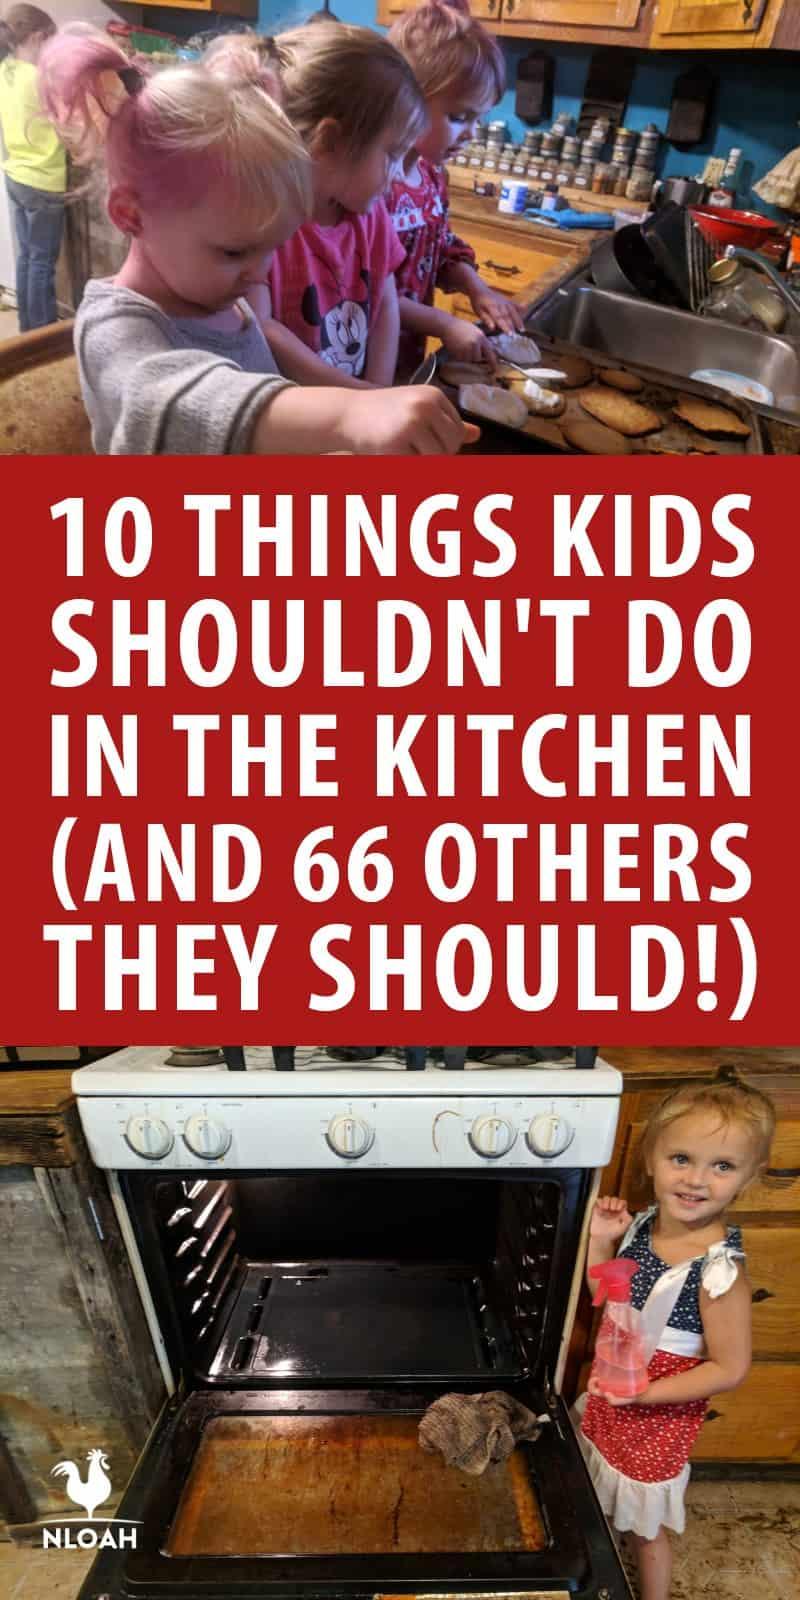 kids should shouldn't do kitchen pinterest